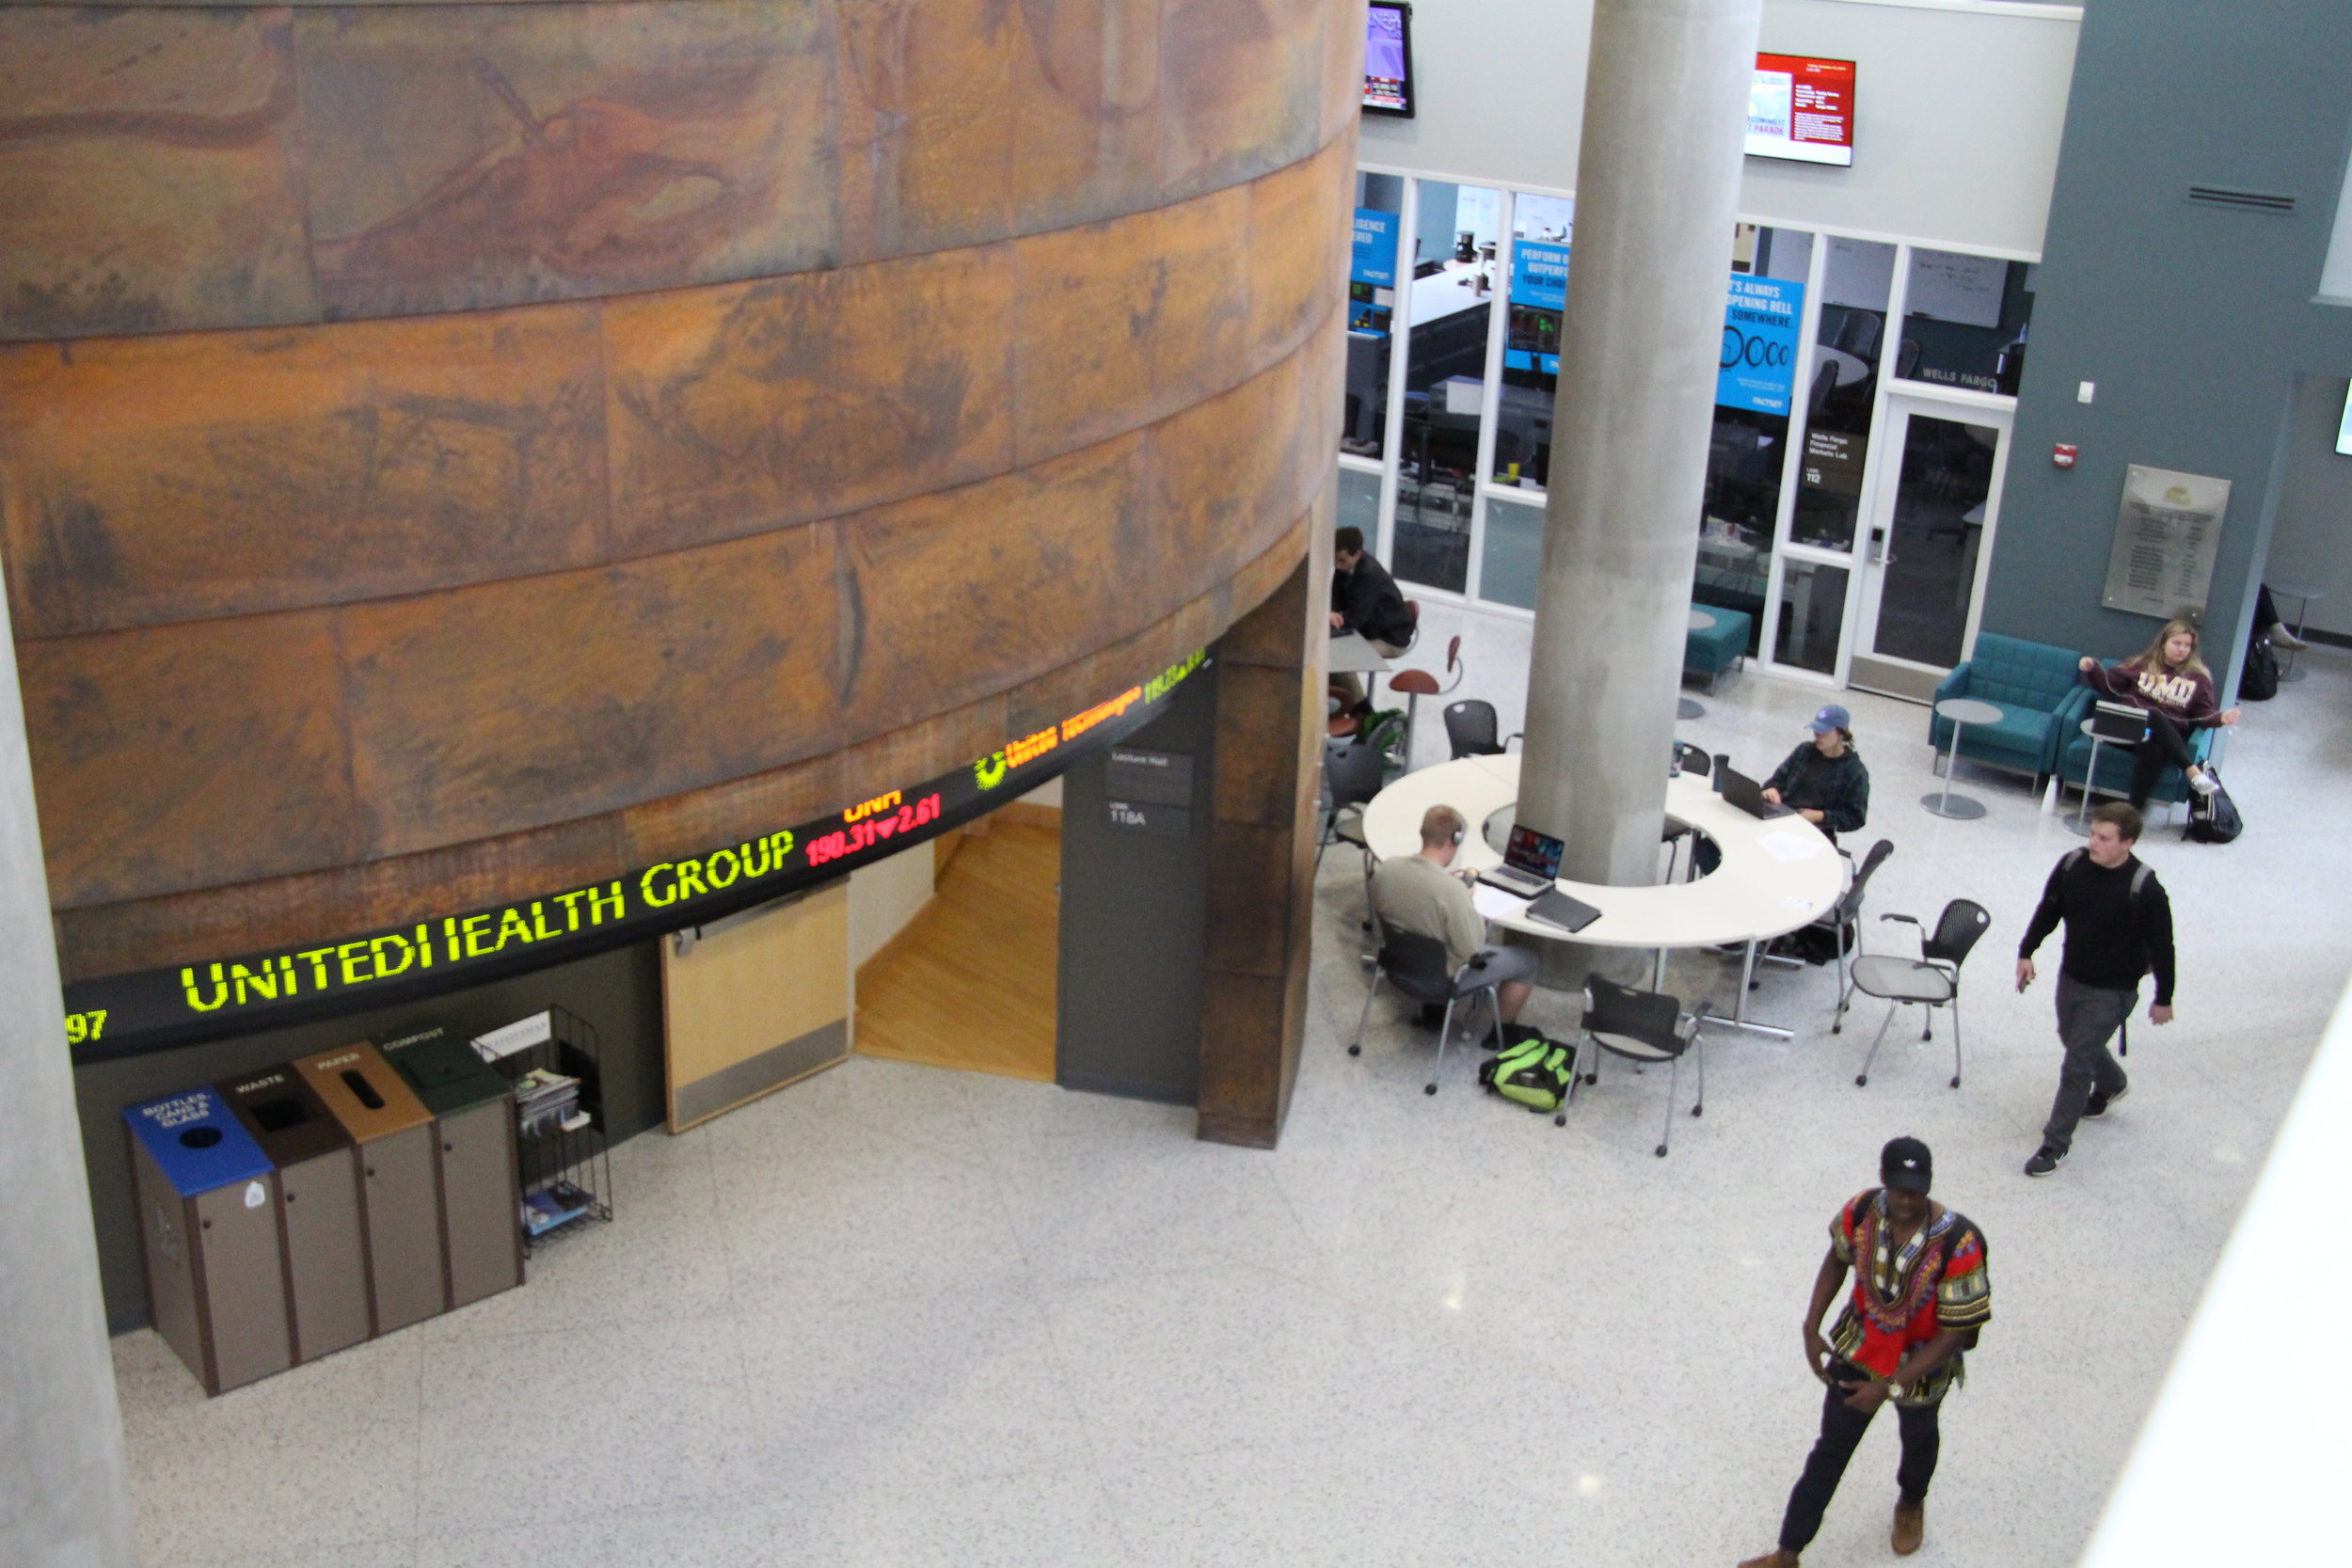 Inside the Labovitz School of Business and Economics